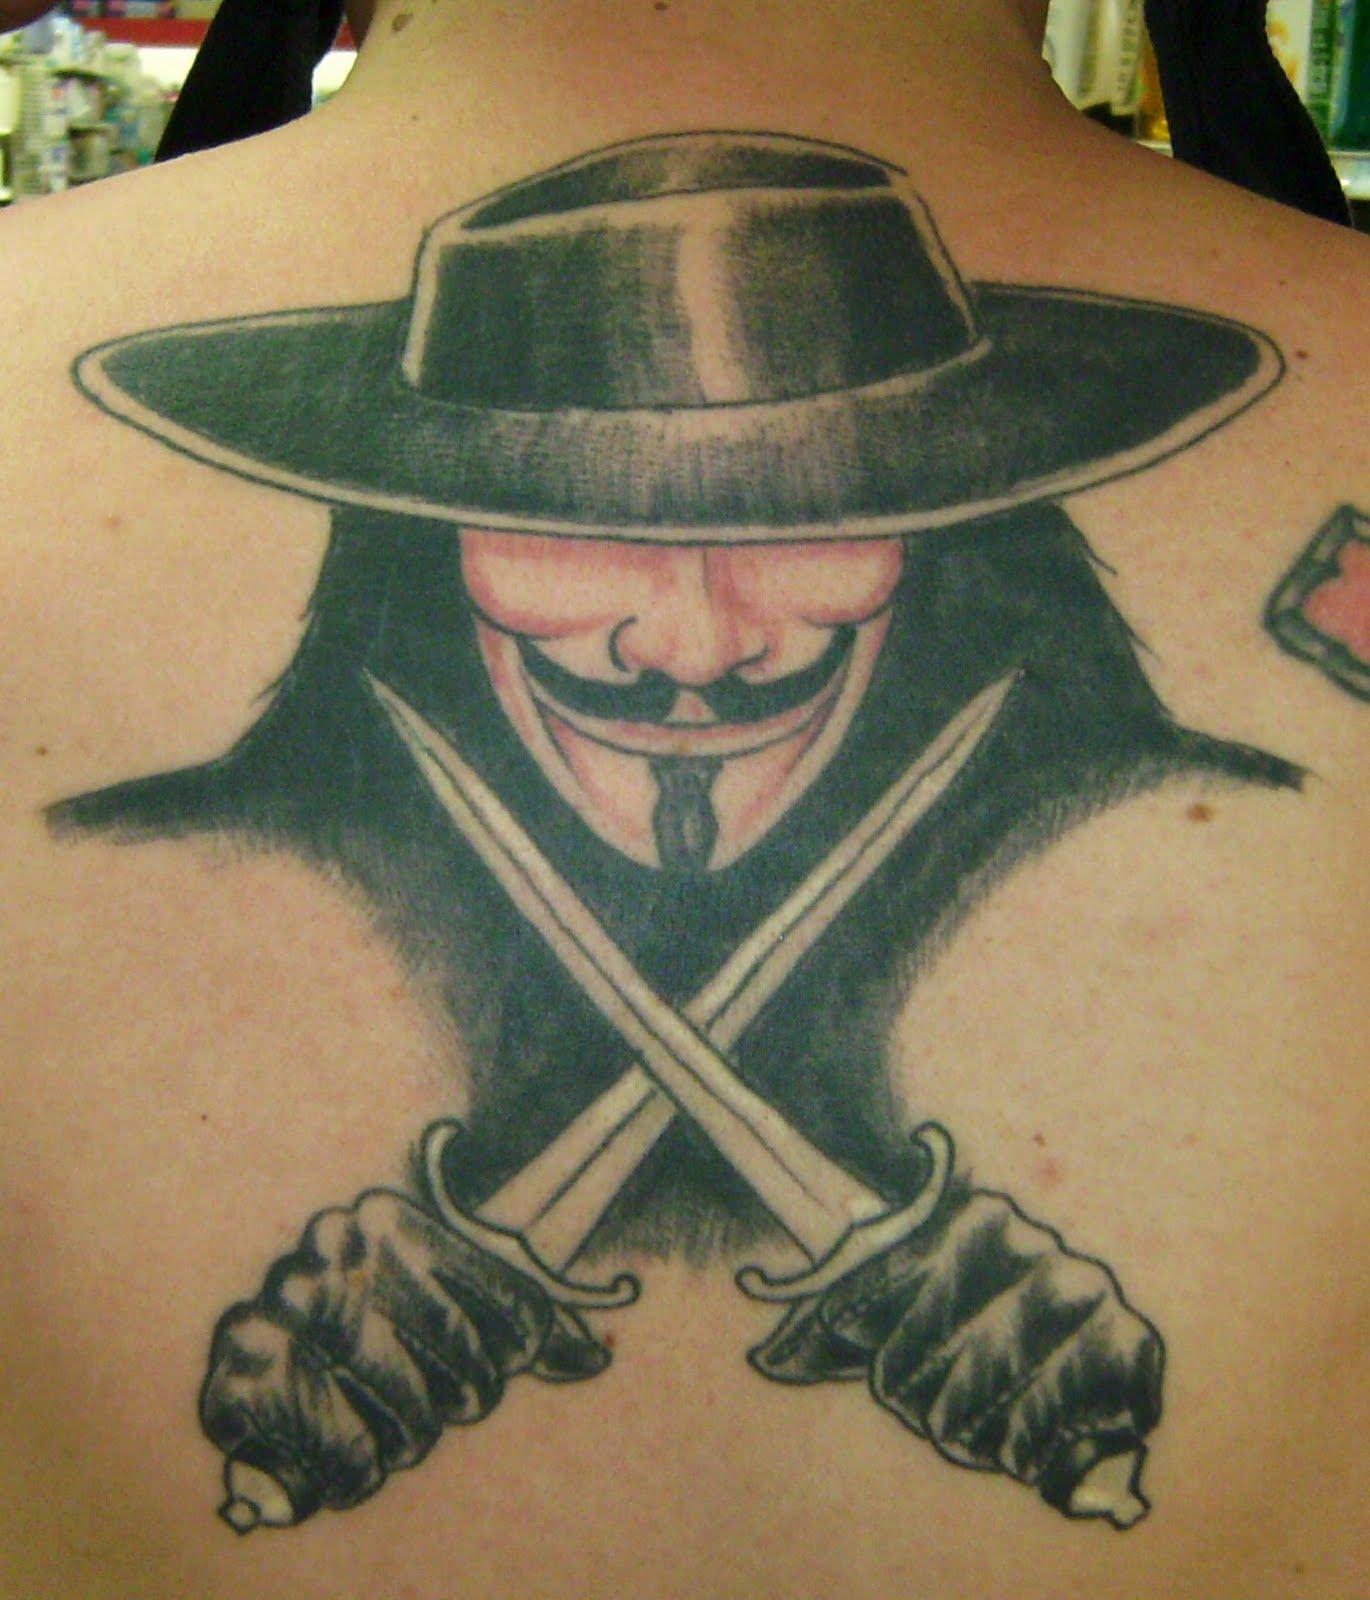 tattoosday a tattoo blog john 39 s tattoo identity with a bonus vendetta. Black Bedroom Furniture Sets. Home Design Ideas